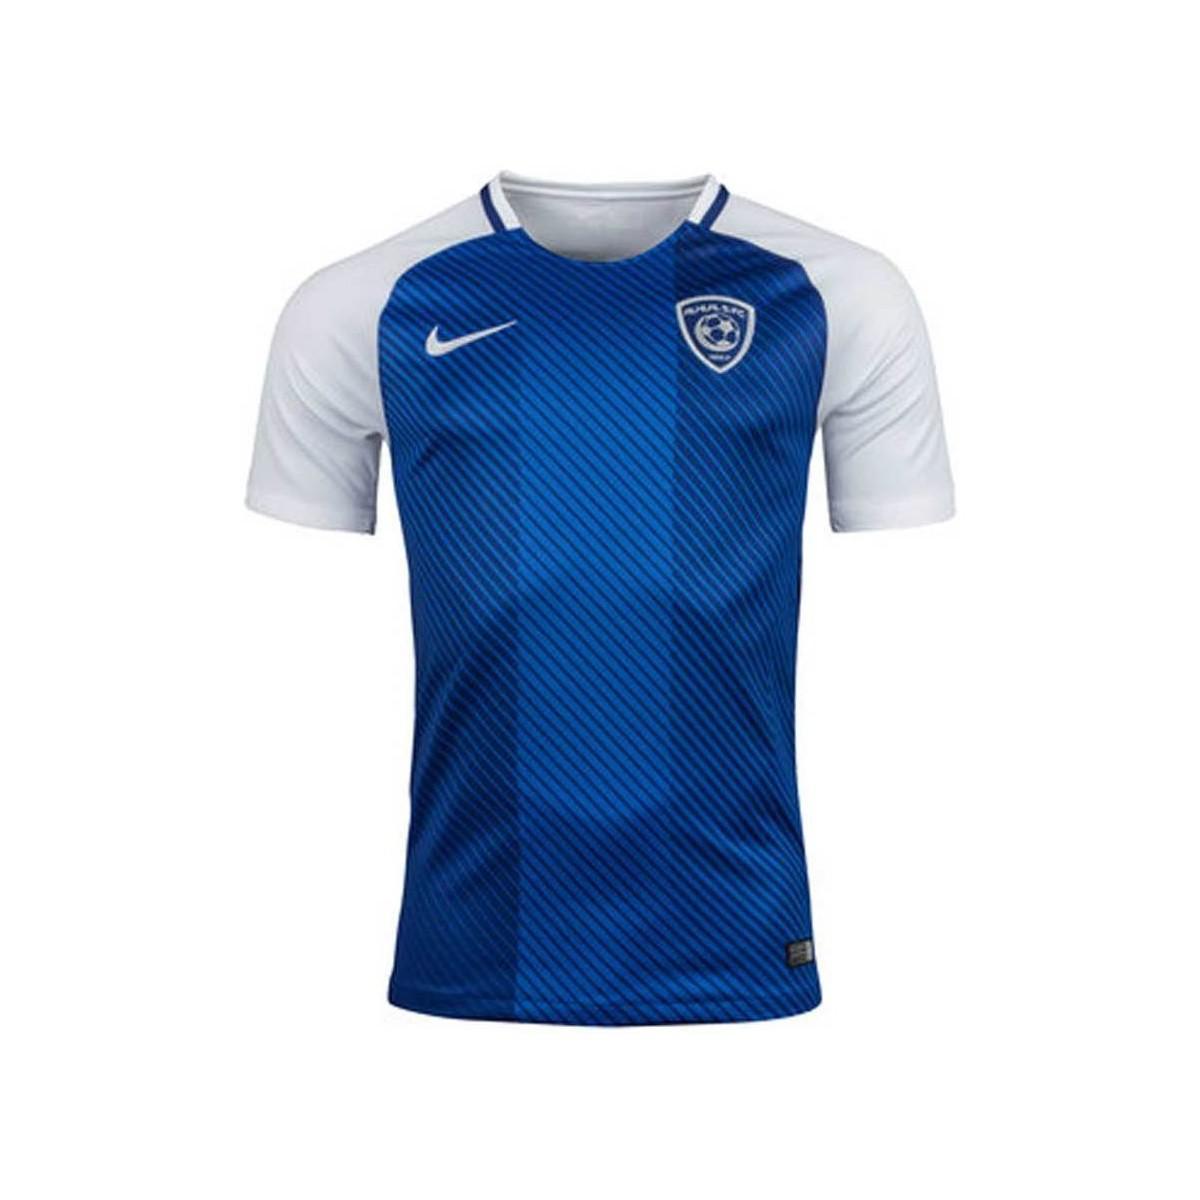 Nike 2017-2018 Al Hilal Home Football Shirt Women s T Shirt In Blue ... fc6a2f741